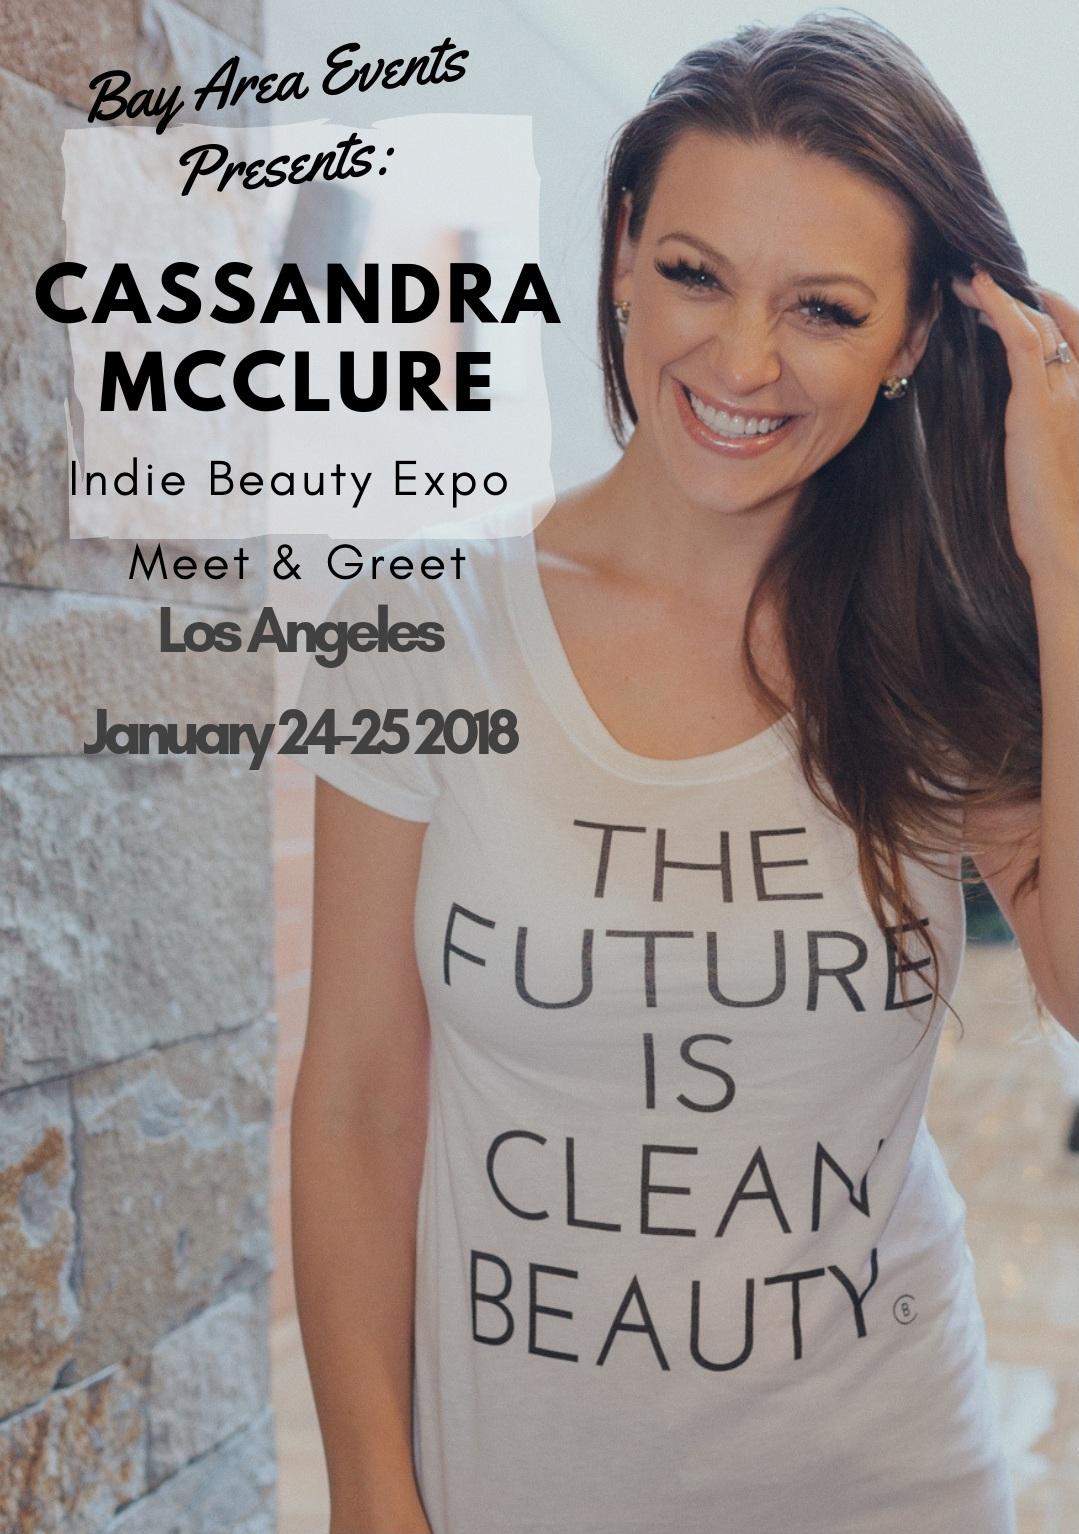 Indie Beauty Expo's clean beauty makeup artist - Los Angeles meet & greet January 24, 25